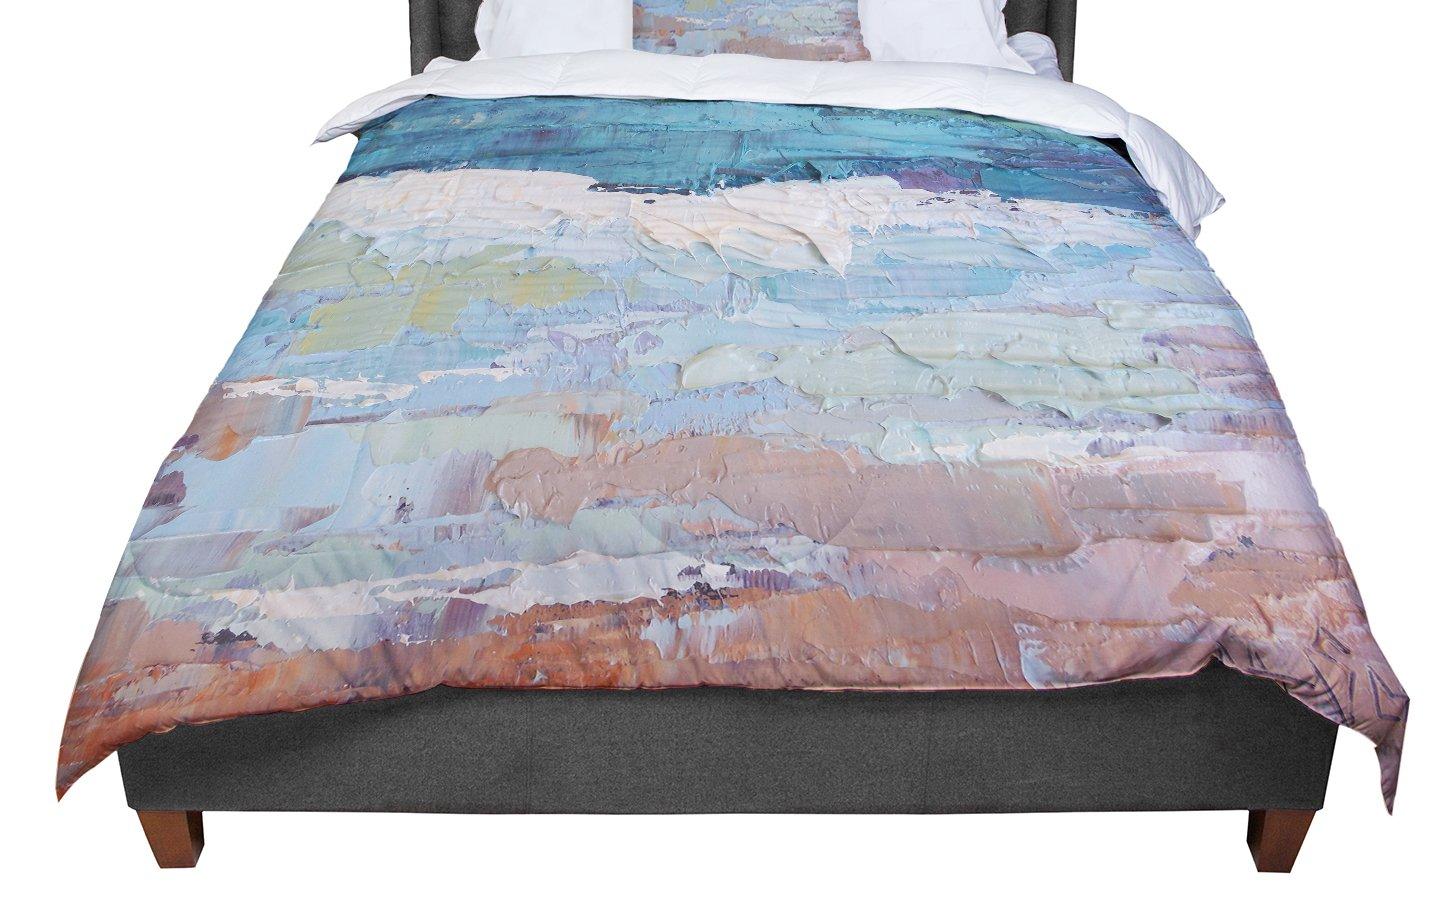 KESS InHouse Carol Schiff 'Surf Dreams' Blue Painting King / Cal King Comforter, 104' X 88'